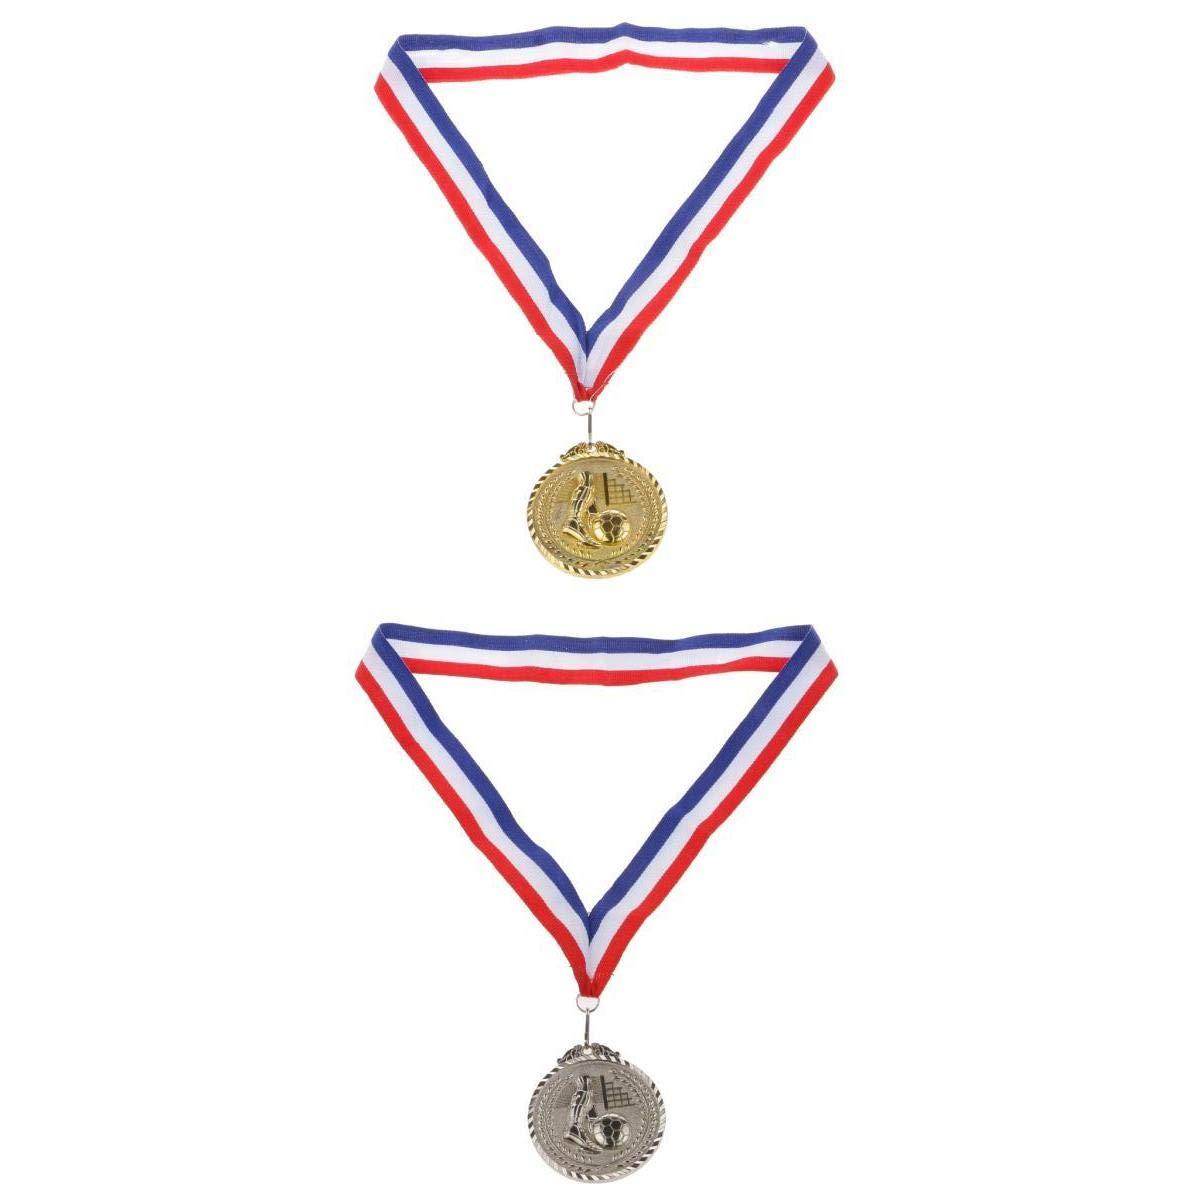 LOVIVER 2X Premios De Medalla De Fútbol / Baloncesto / Taekwondo ...